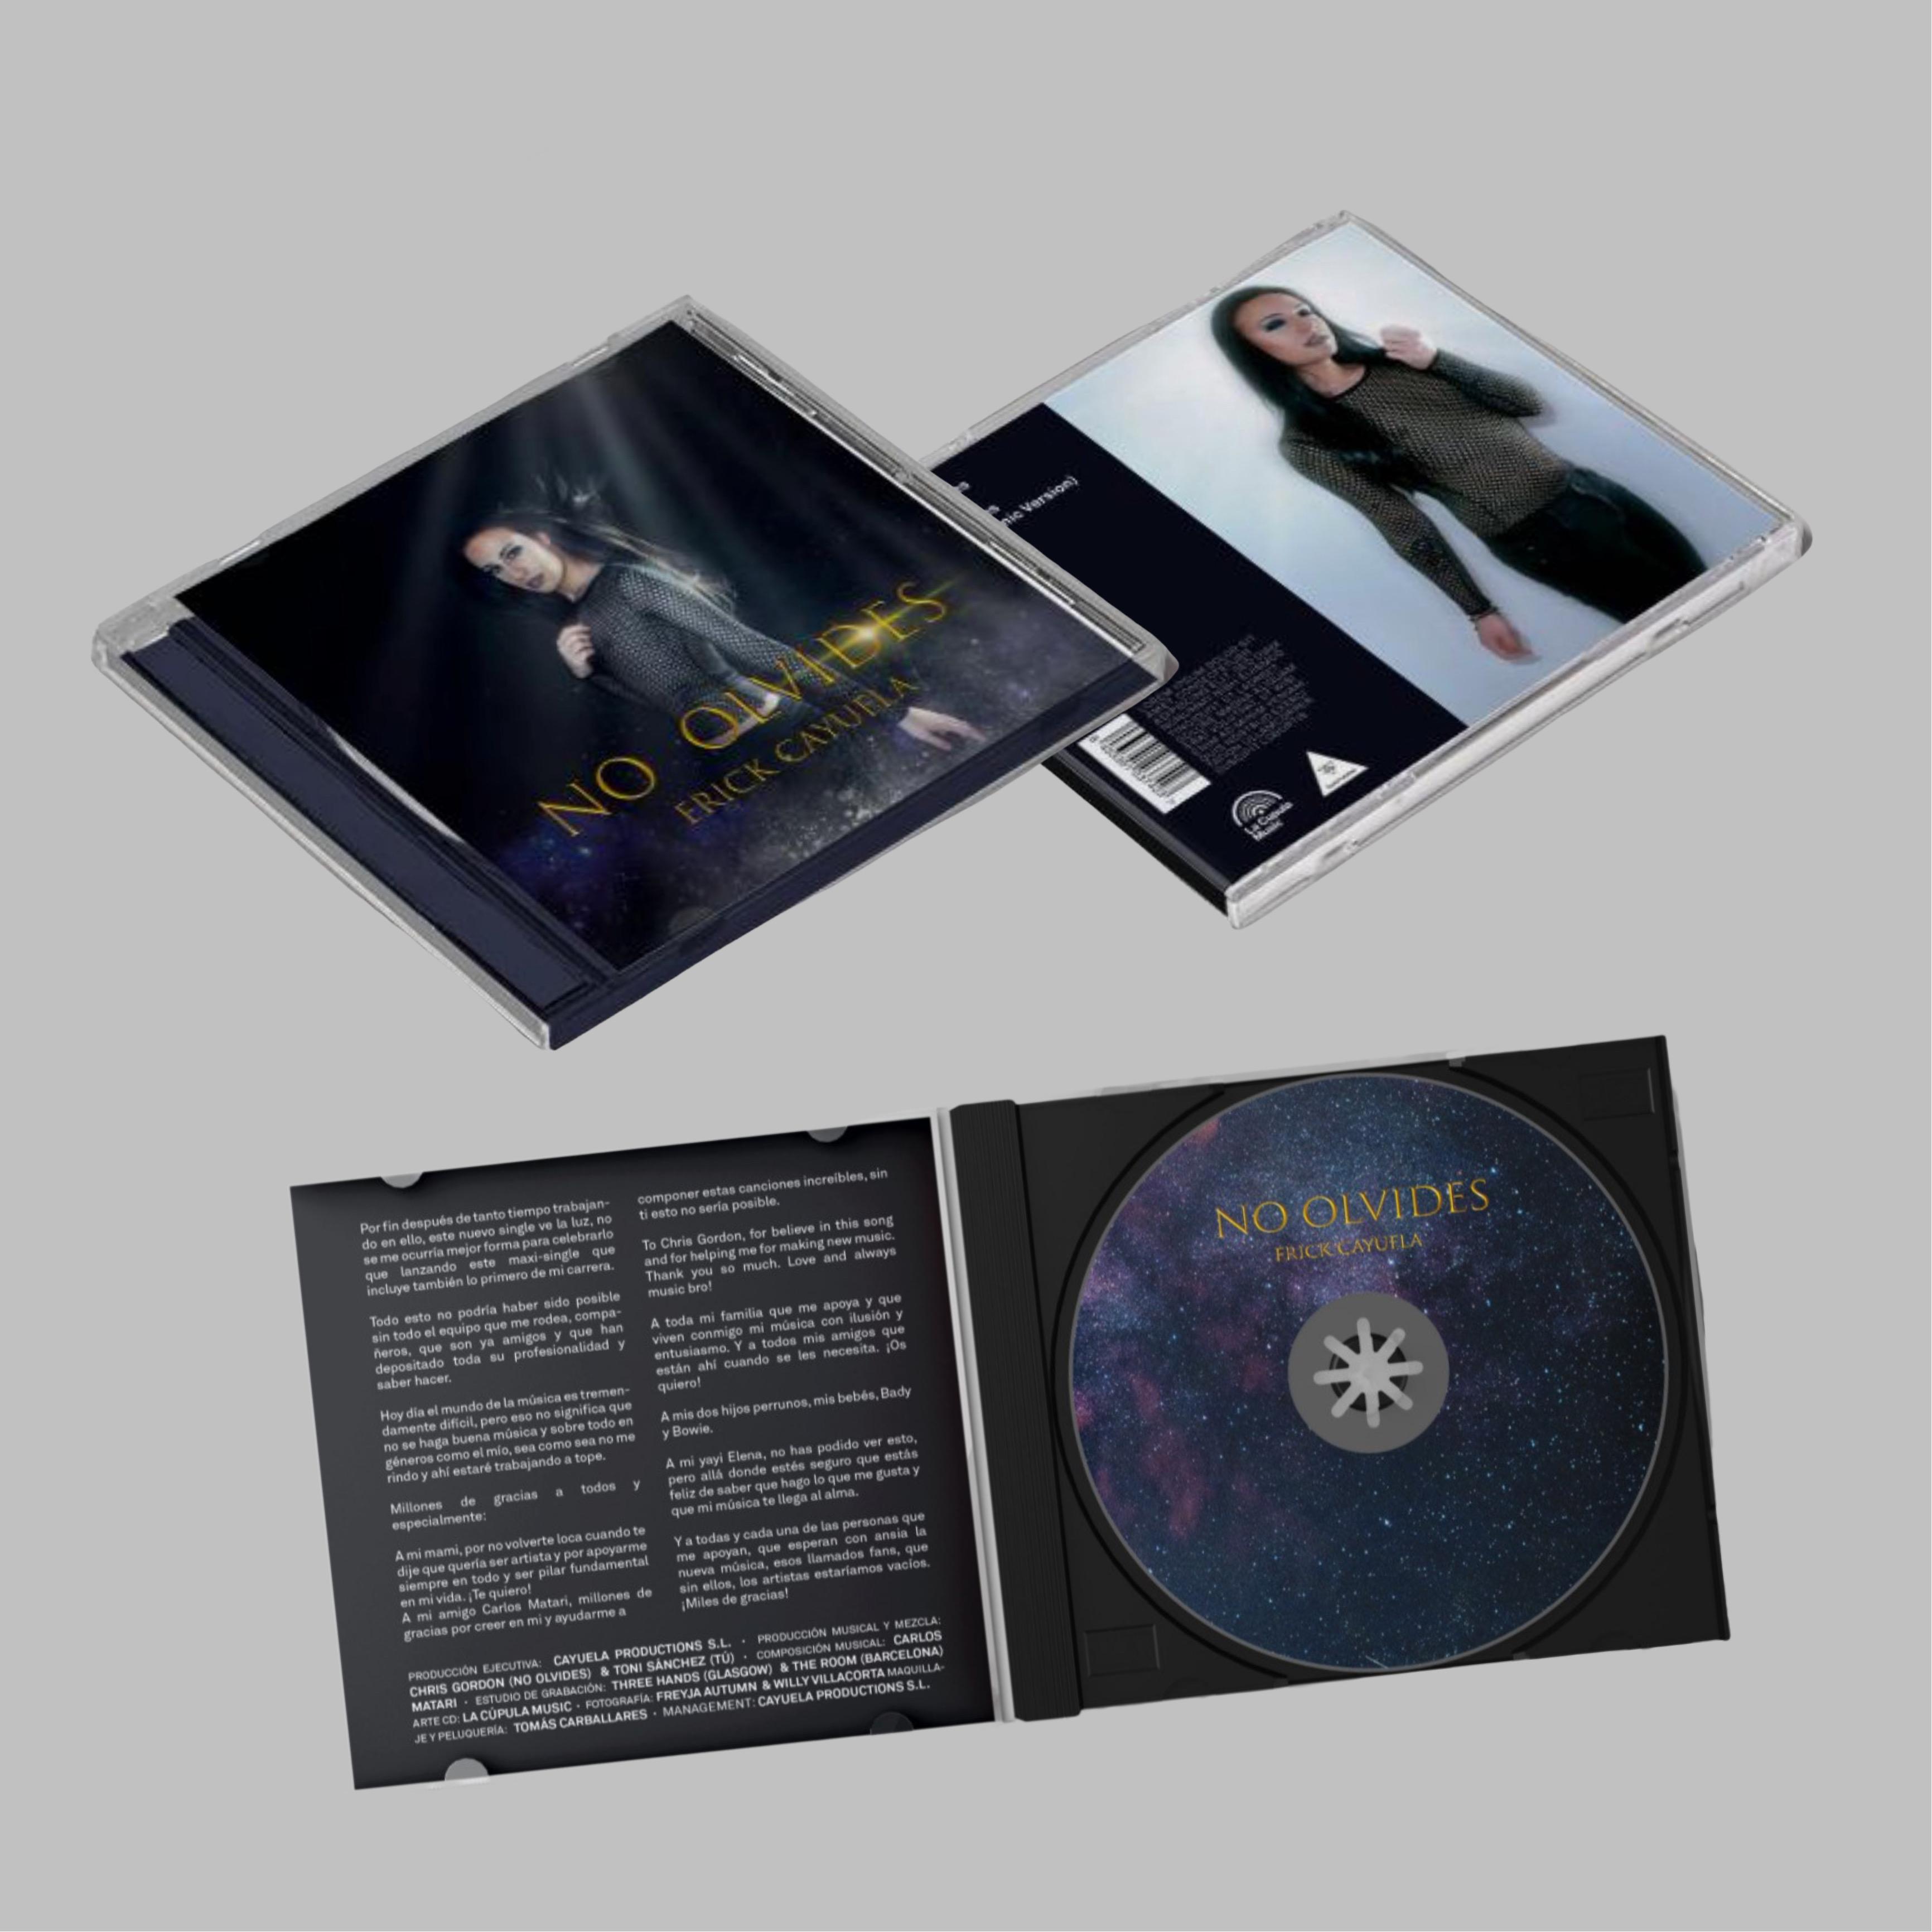 CD - NO OLVIDES (Firmado)